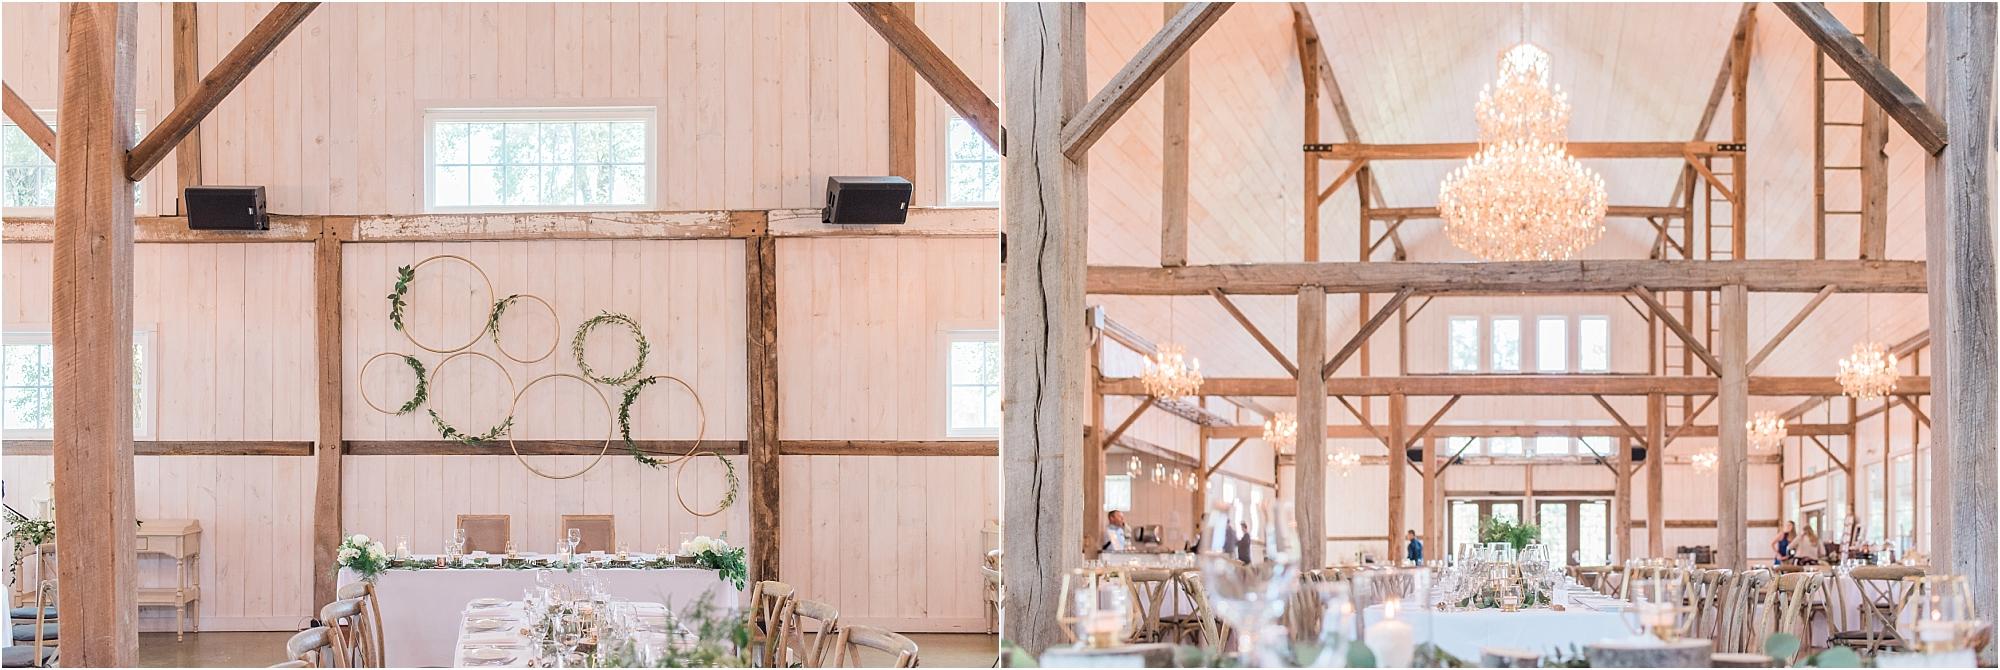 0079 Summer Stonefields Wedding Carleton Place - Ottawa Wedding - Photography by Emma_WEB.jpg